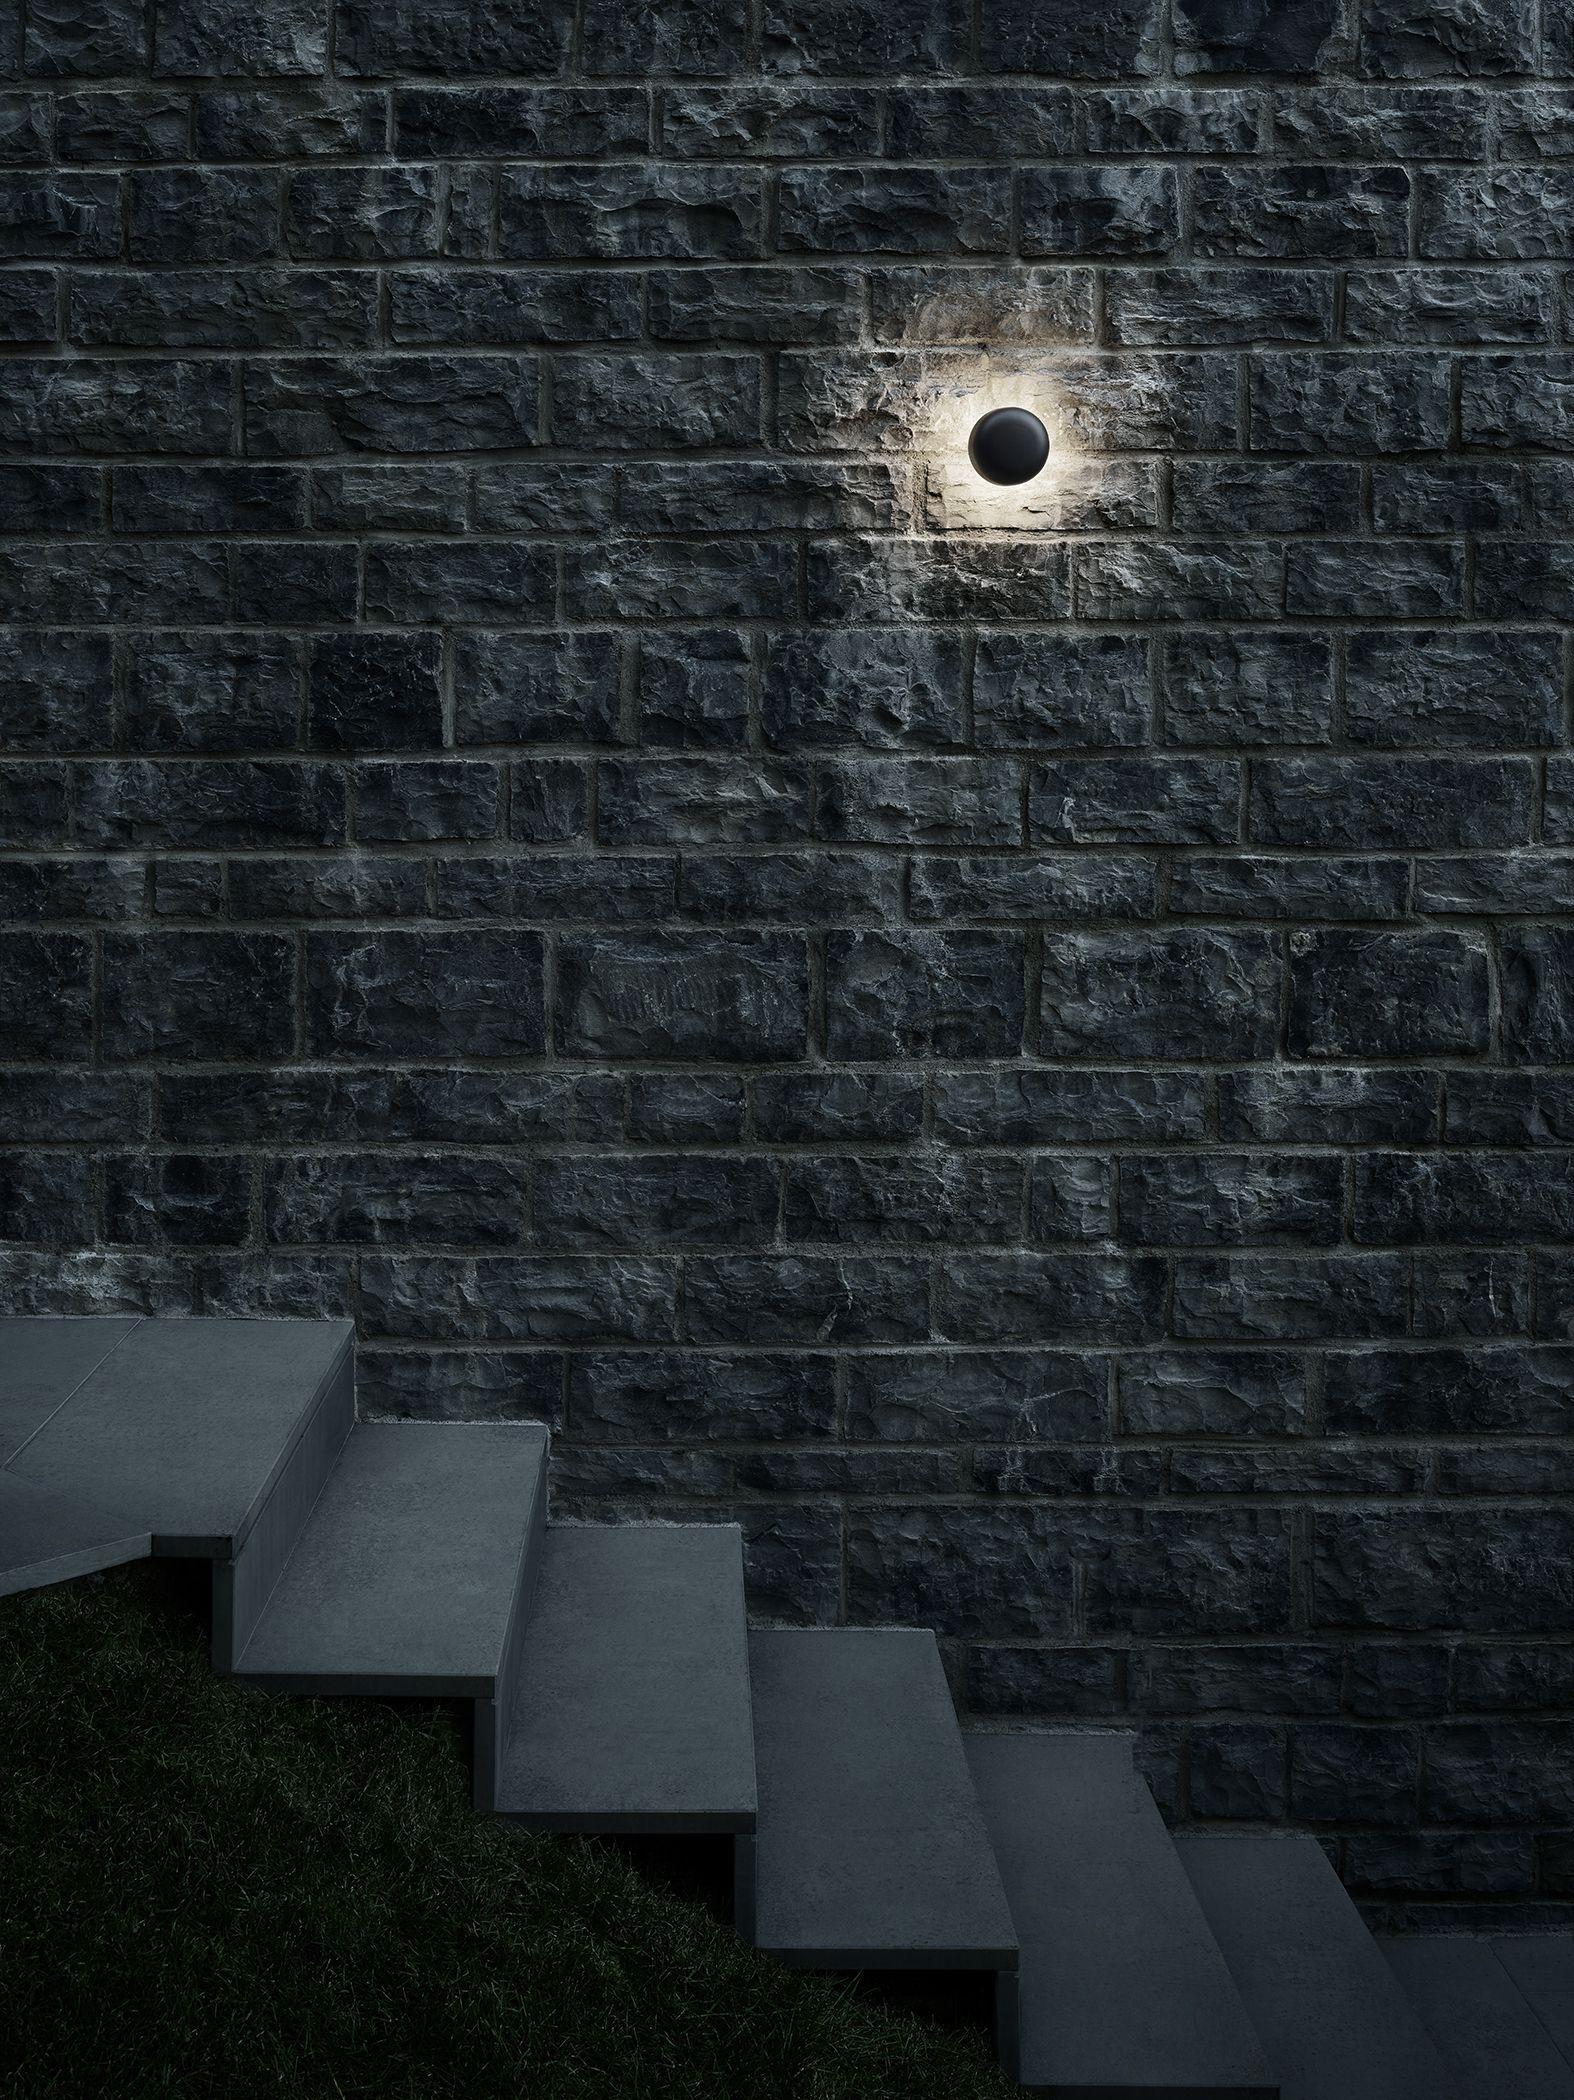 Bellhop Wall Dali Black F003c41d030 Flos Bellhop Bestebeleuchtung Black Dali F003c41 In 2020 Dali Beleuchtung Licht